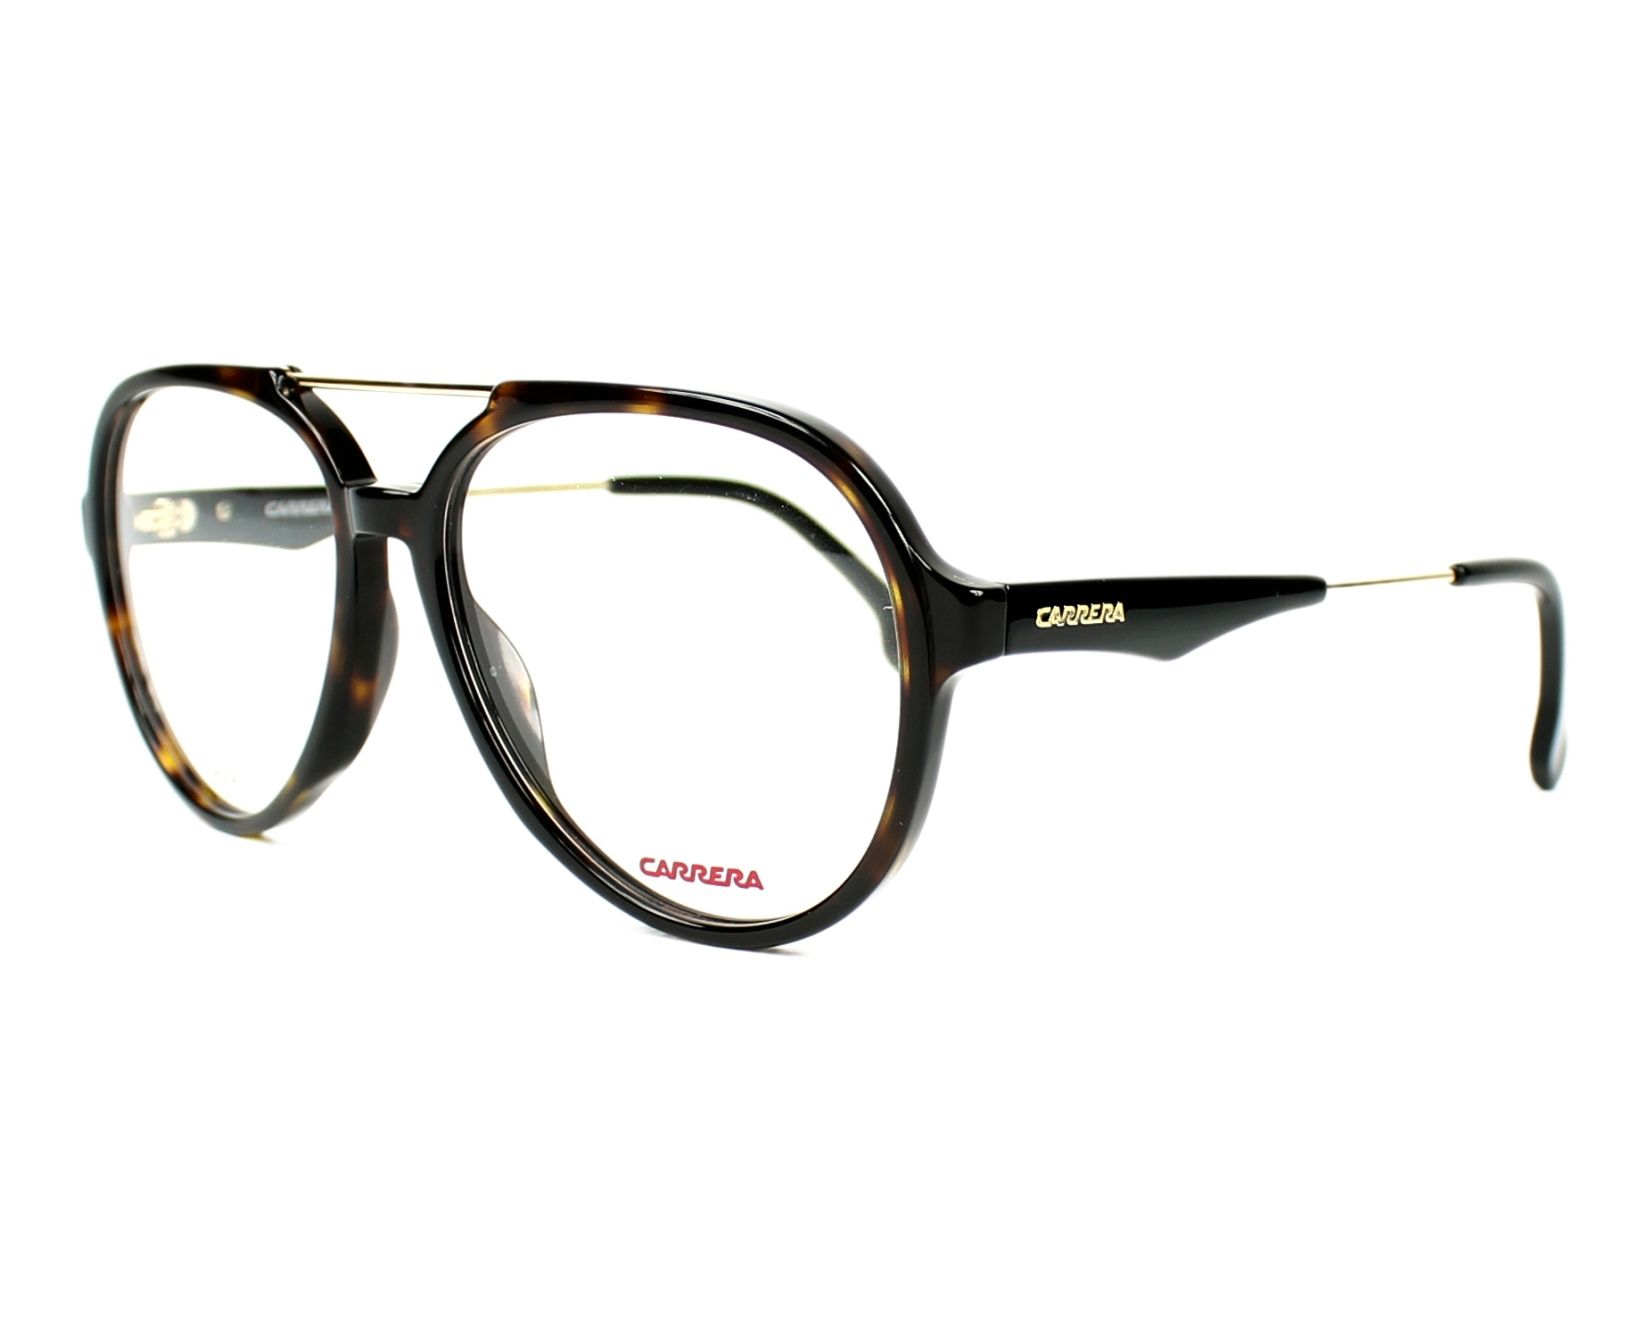 Carrera - Buy Carrera eyeglasses online at low prices